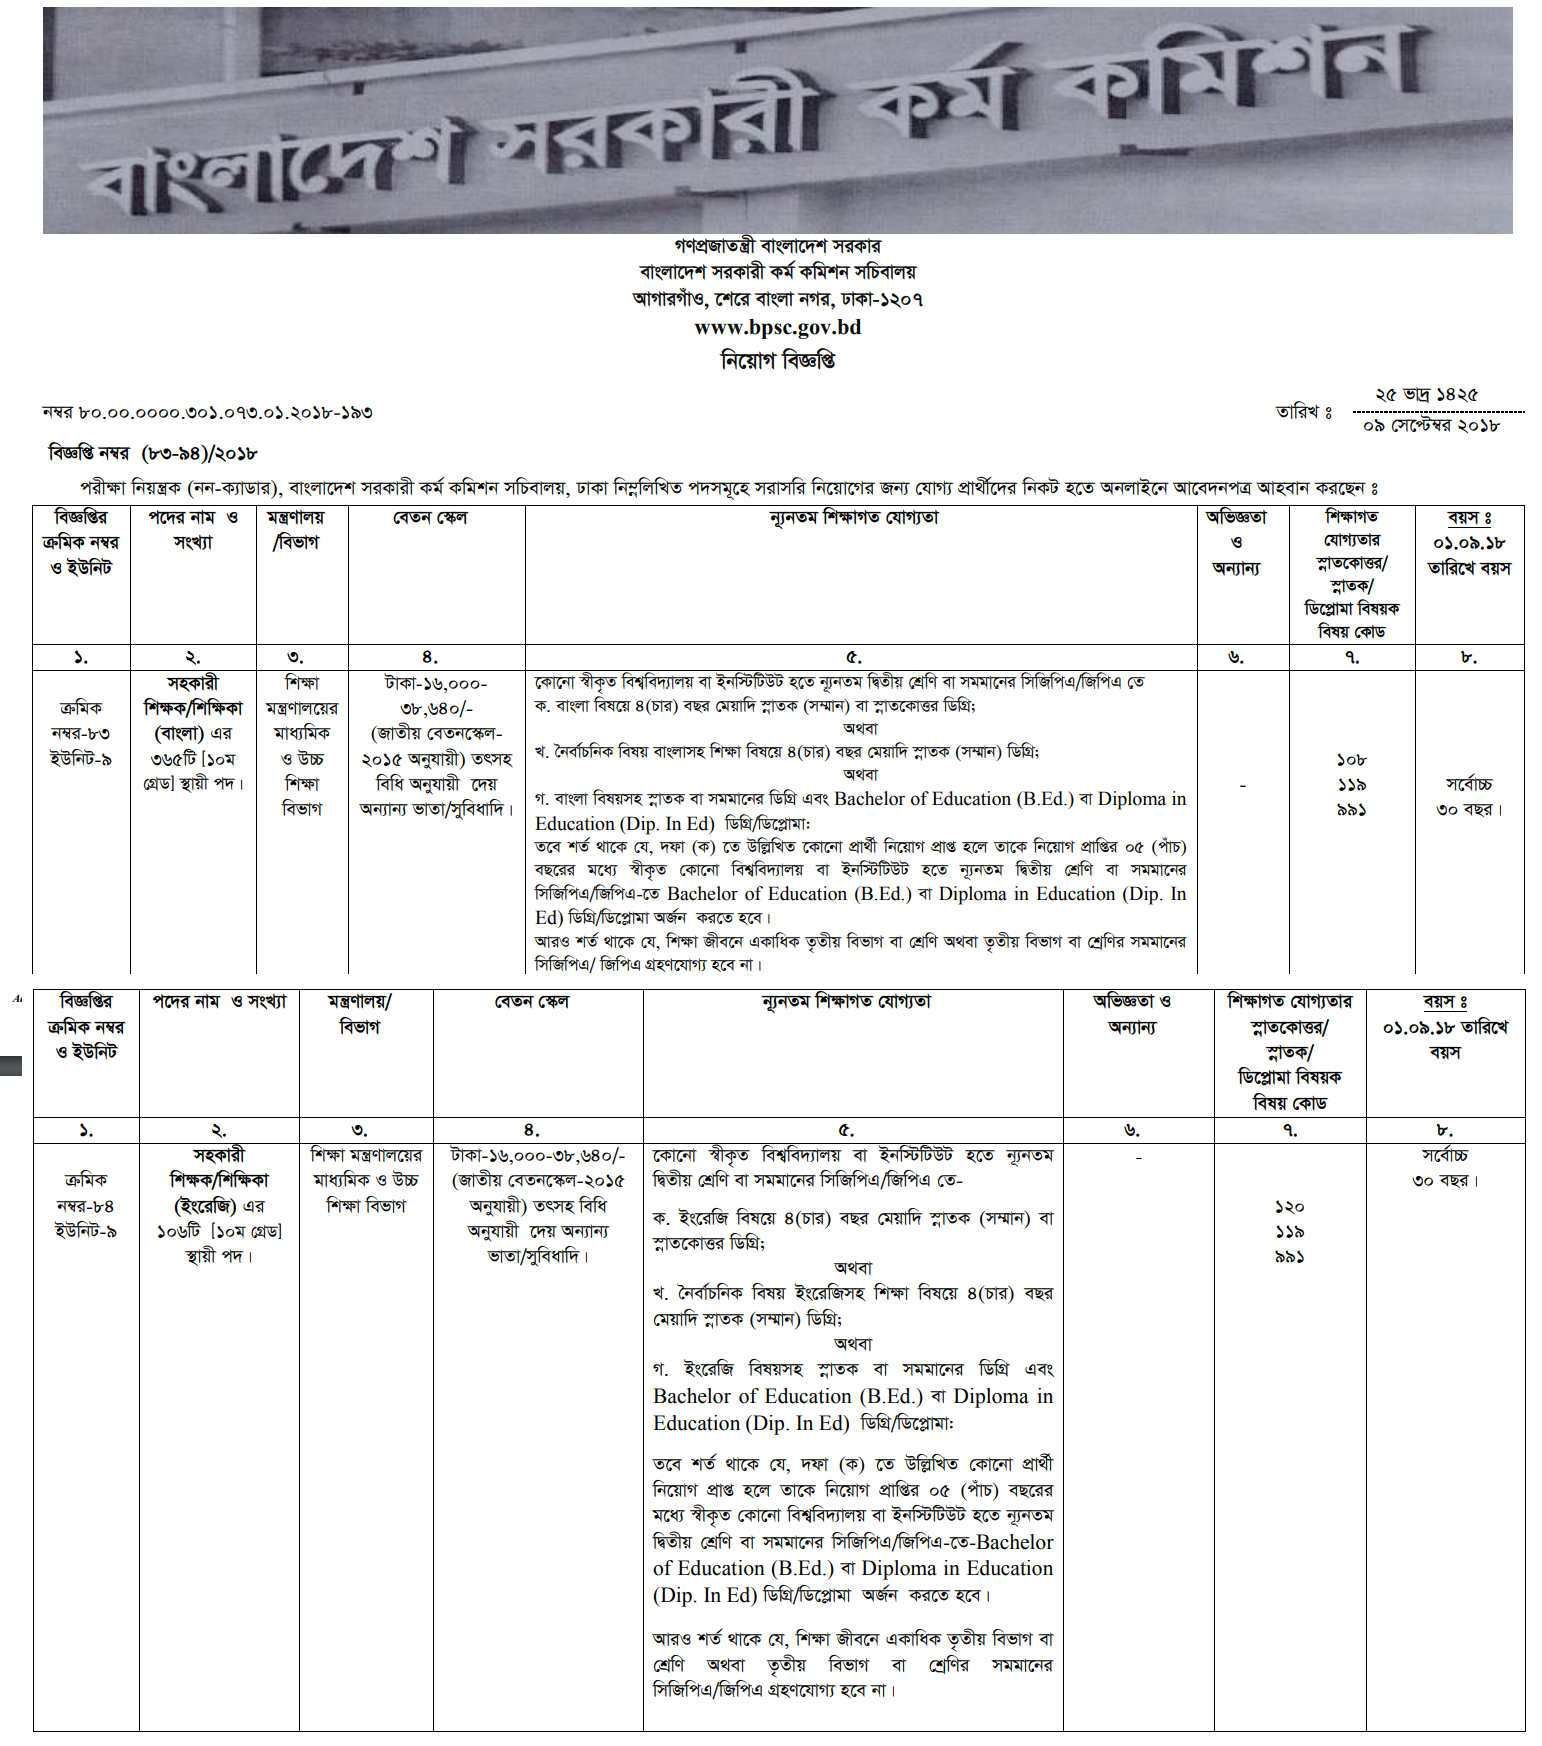 BPSC Job Circular Application Form 2018 - www bpsc gov bd